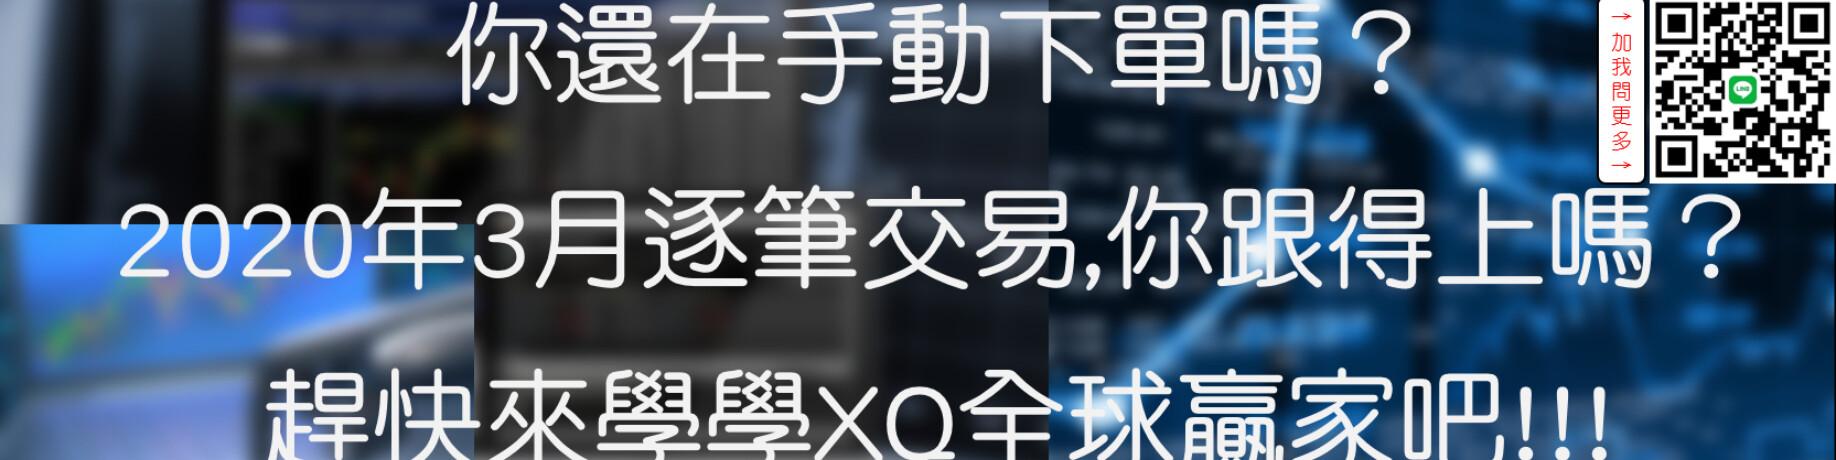 Trader Xiao - 程式交易